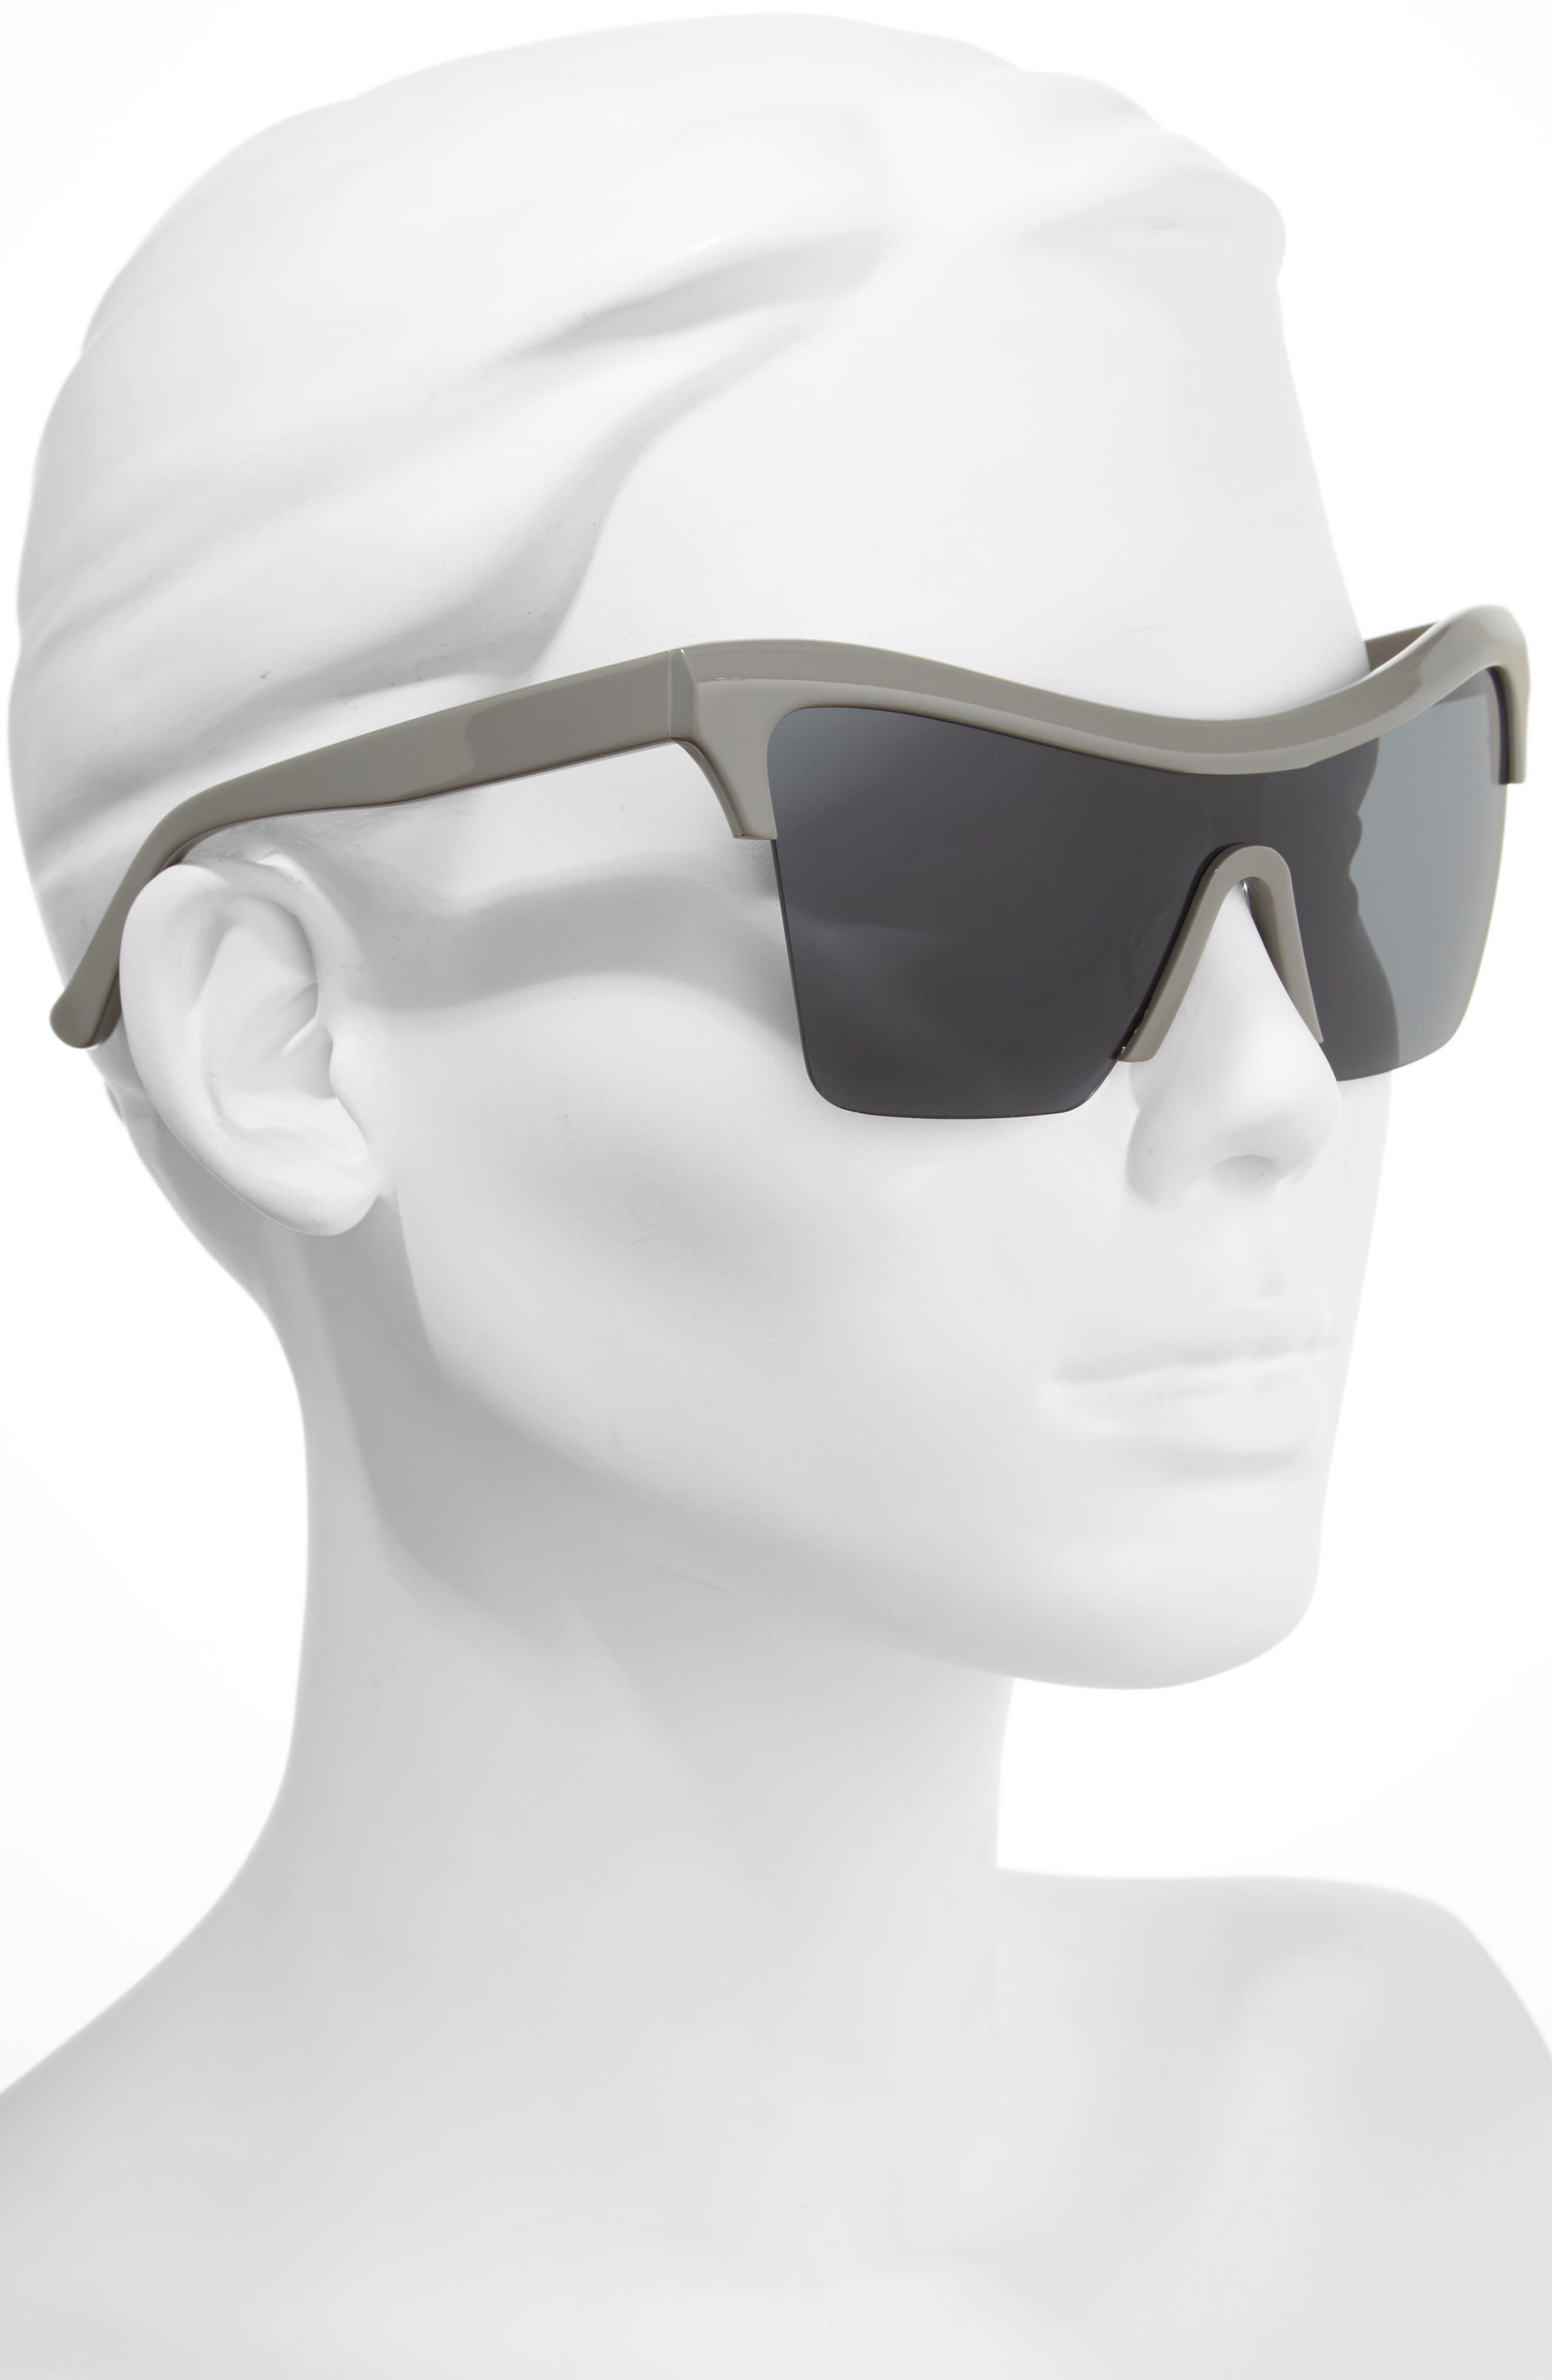 Passport Control 68mm Sunglasses,                             Alternate thumbnail 2, color,                             020